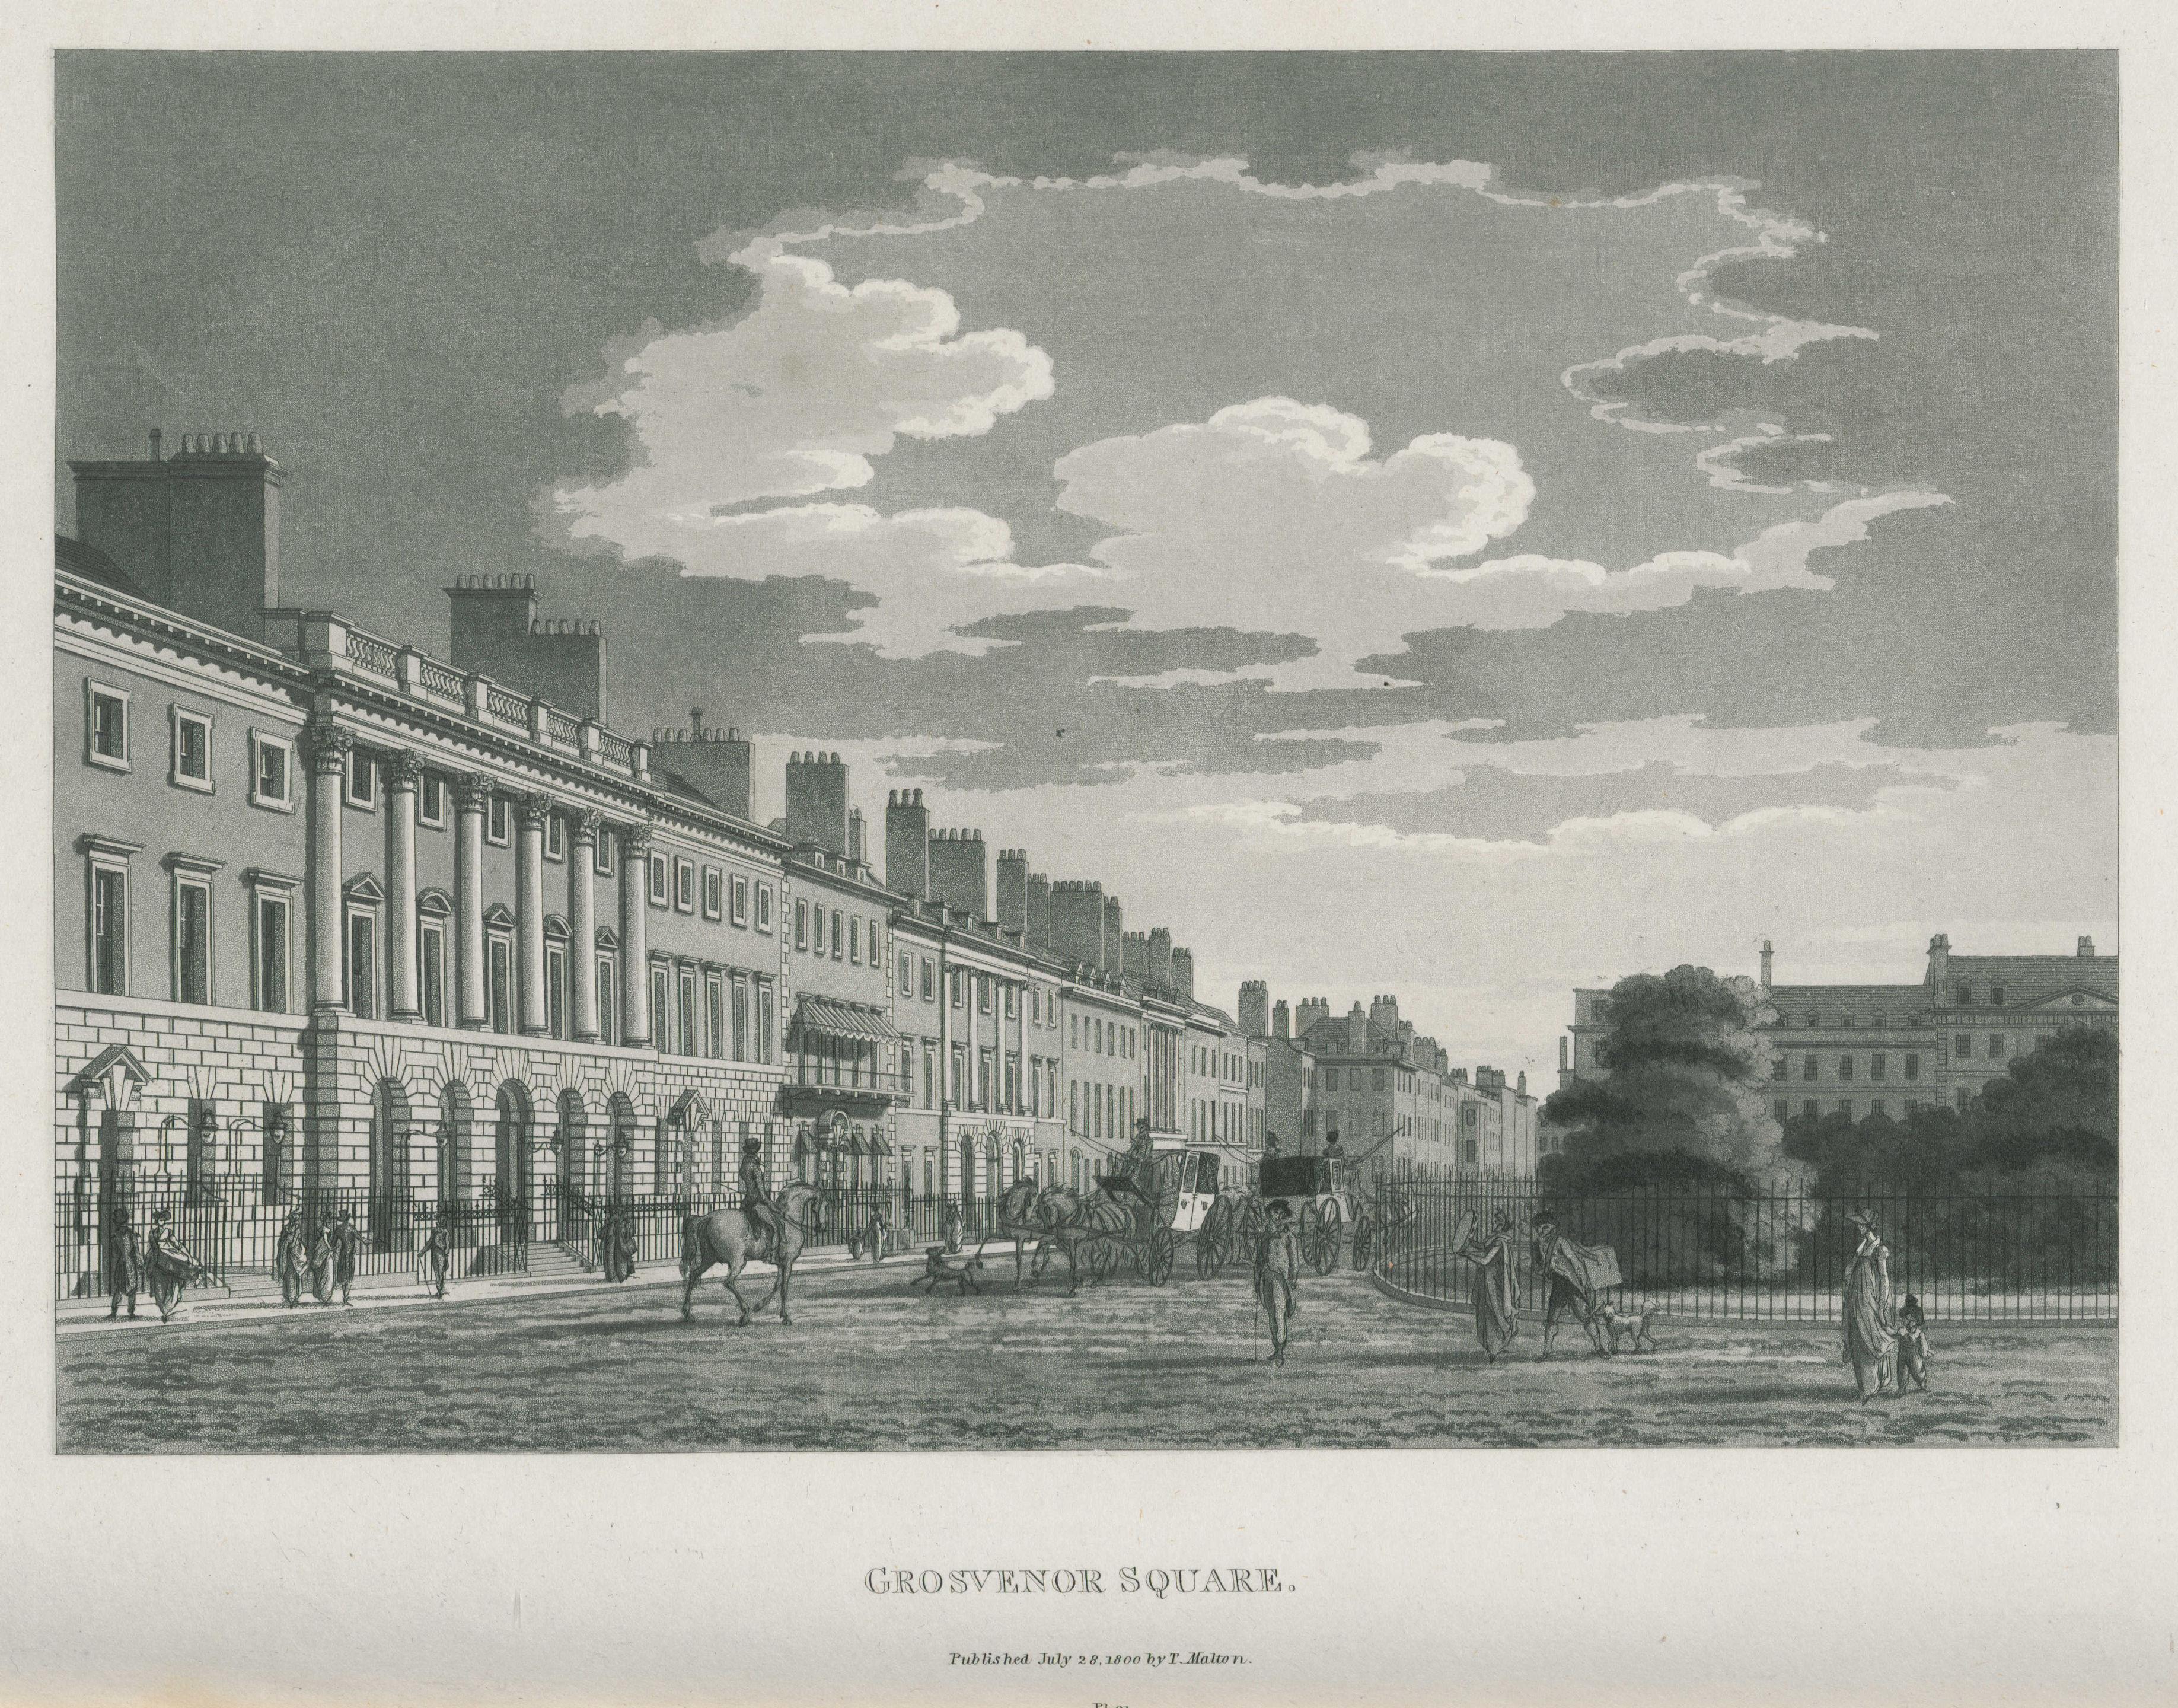 091 - Malton - Grosvenor Square